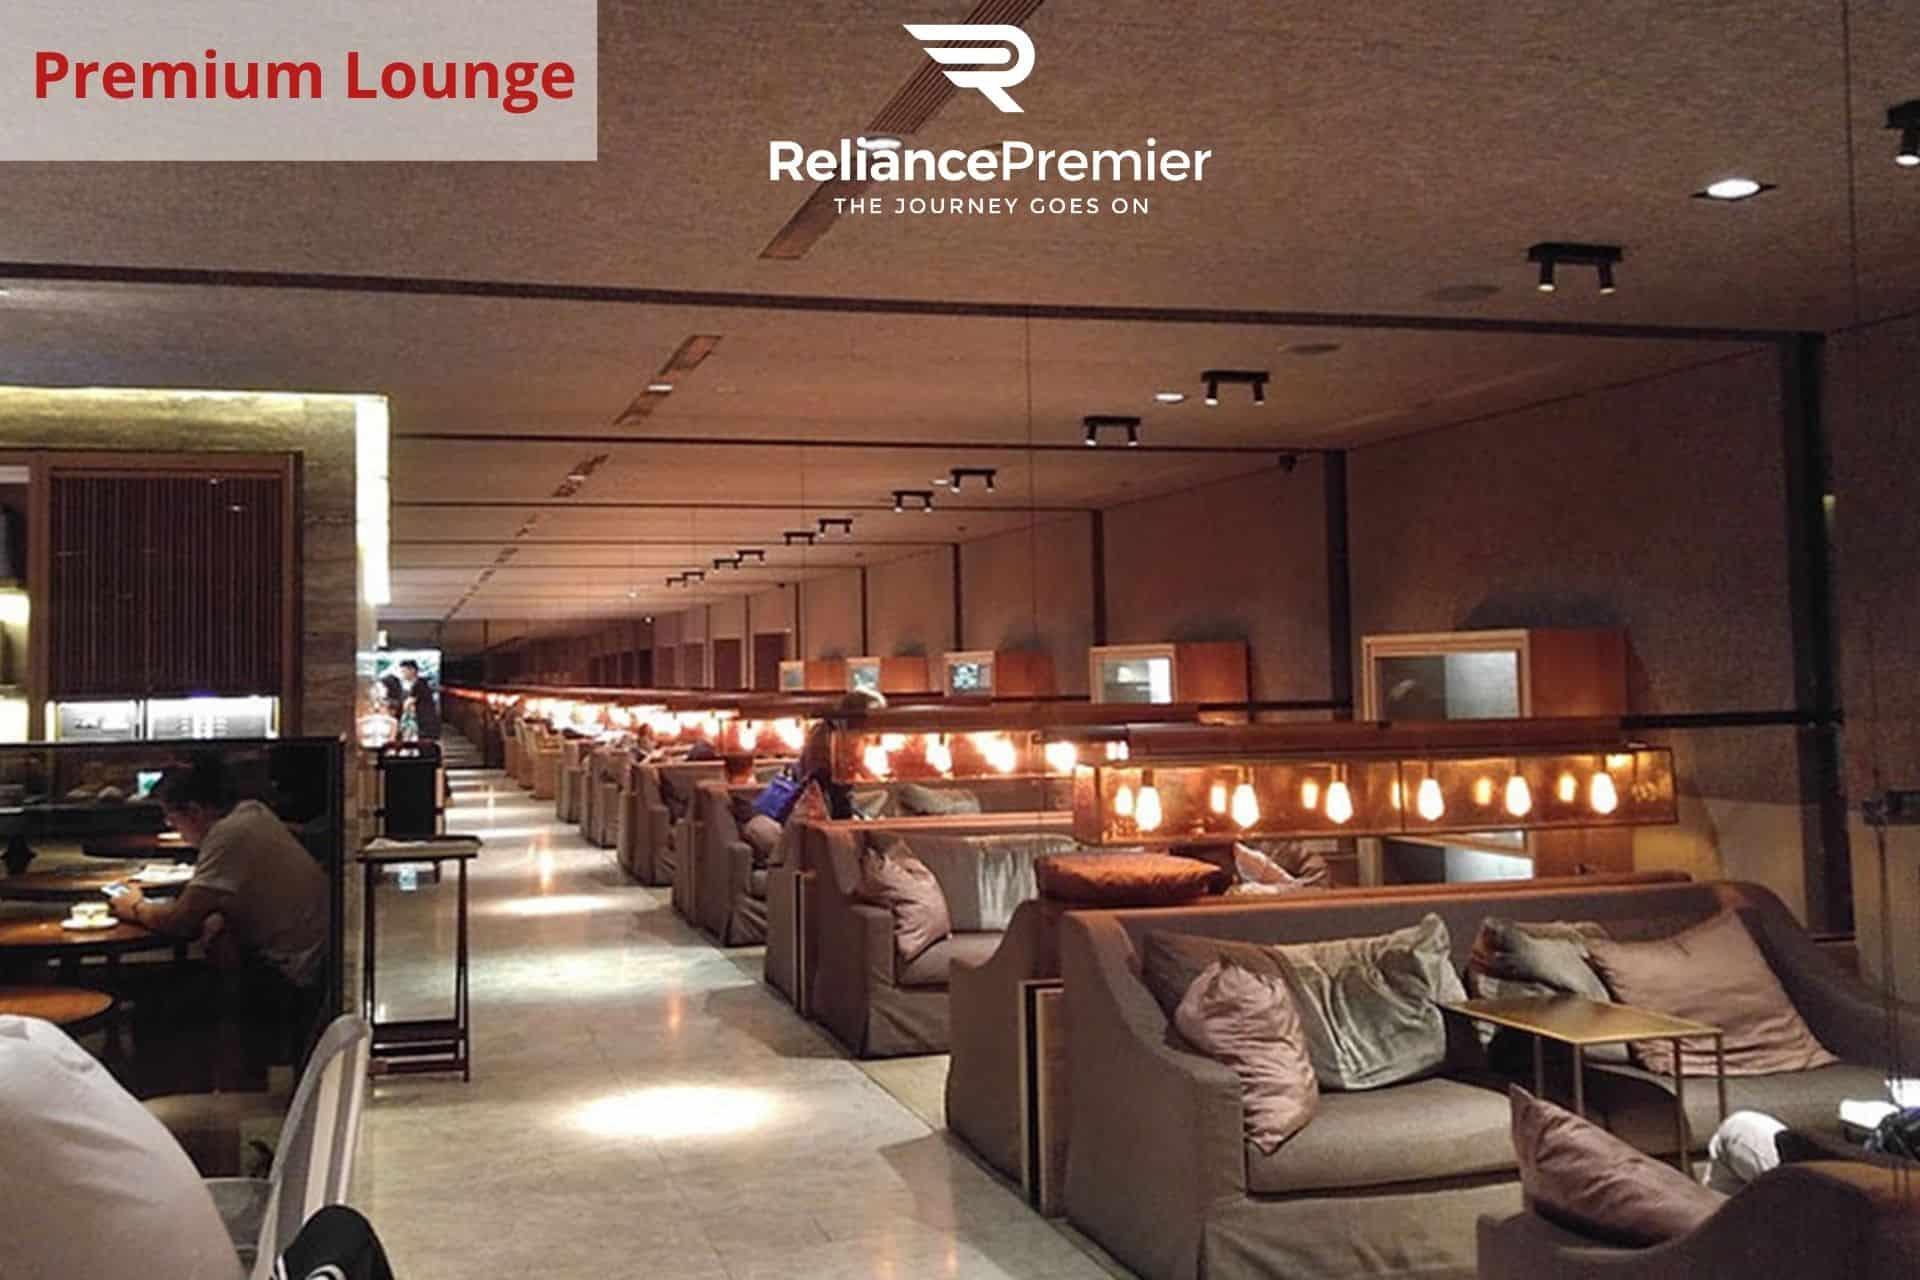 Malindo Air Premium Lounge